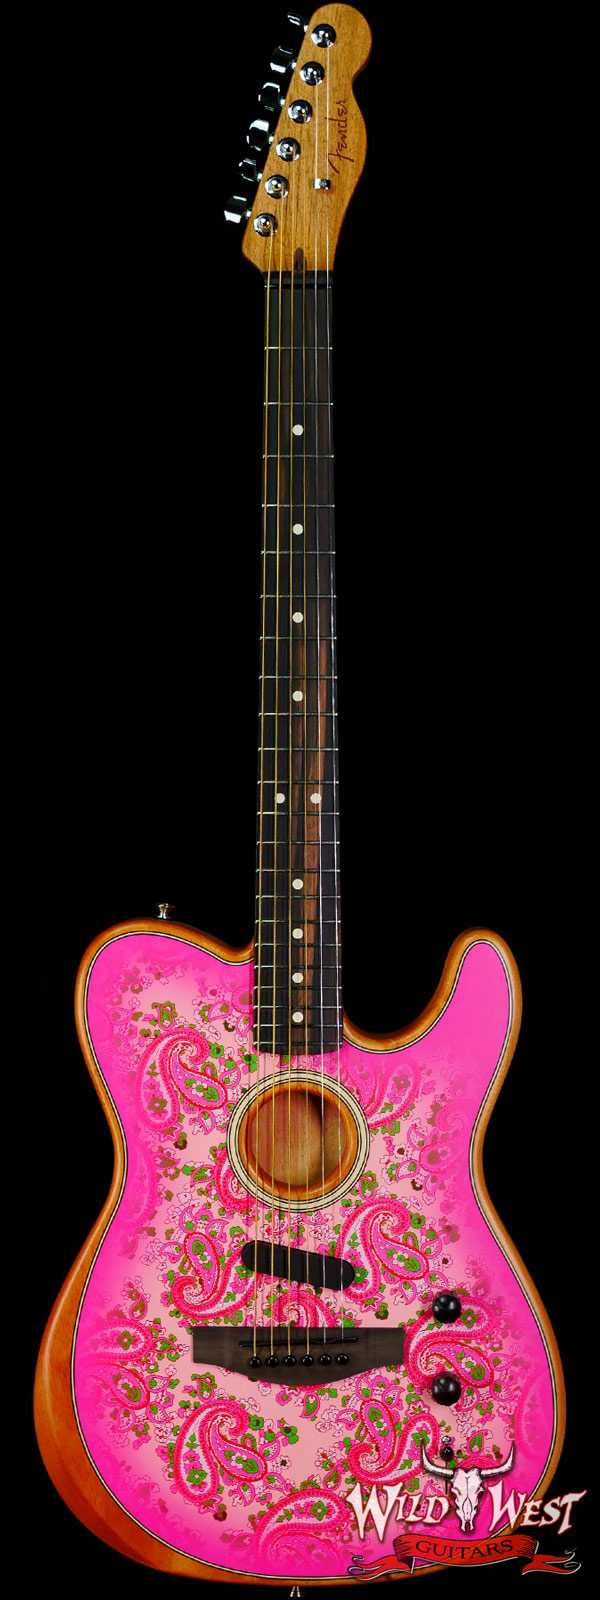 Fender American Acoustasonic Telecaster Ebony Fingerboard Pink Paisley 4.80 LBS US221860A